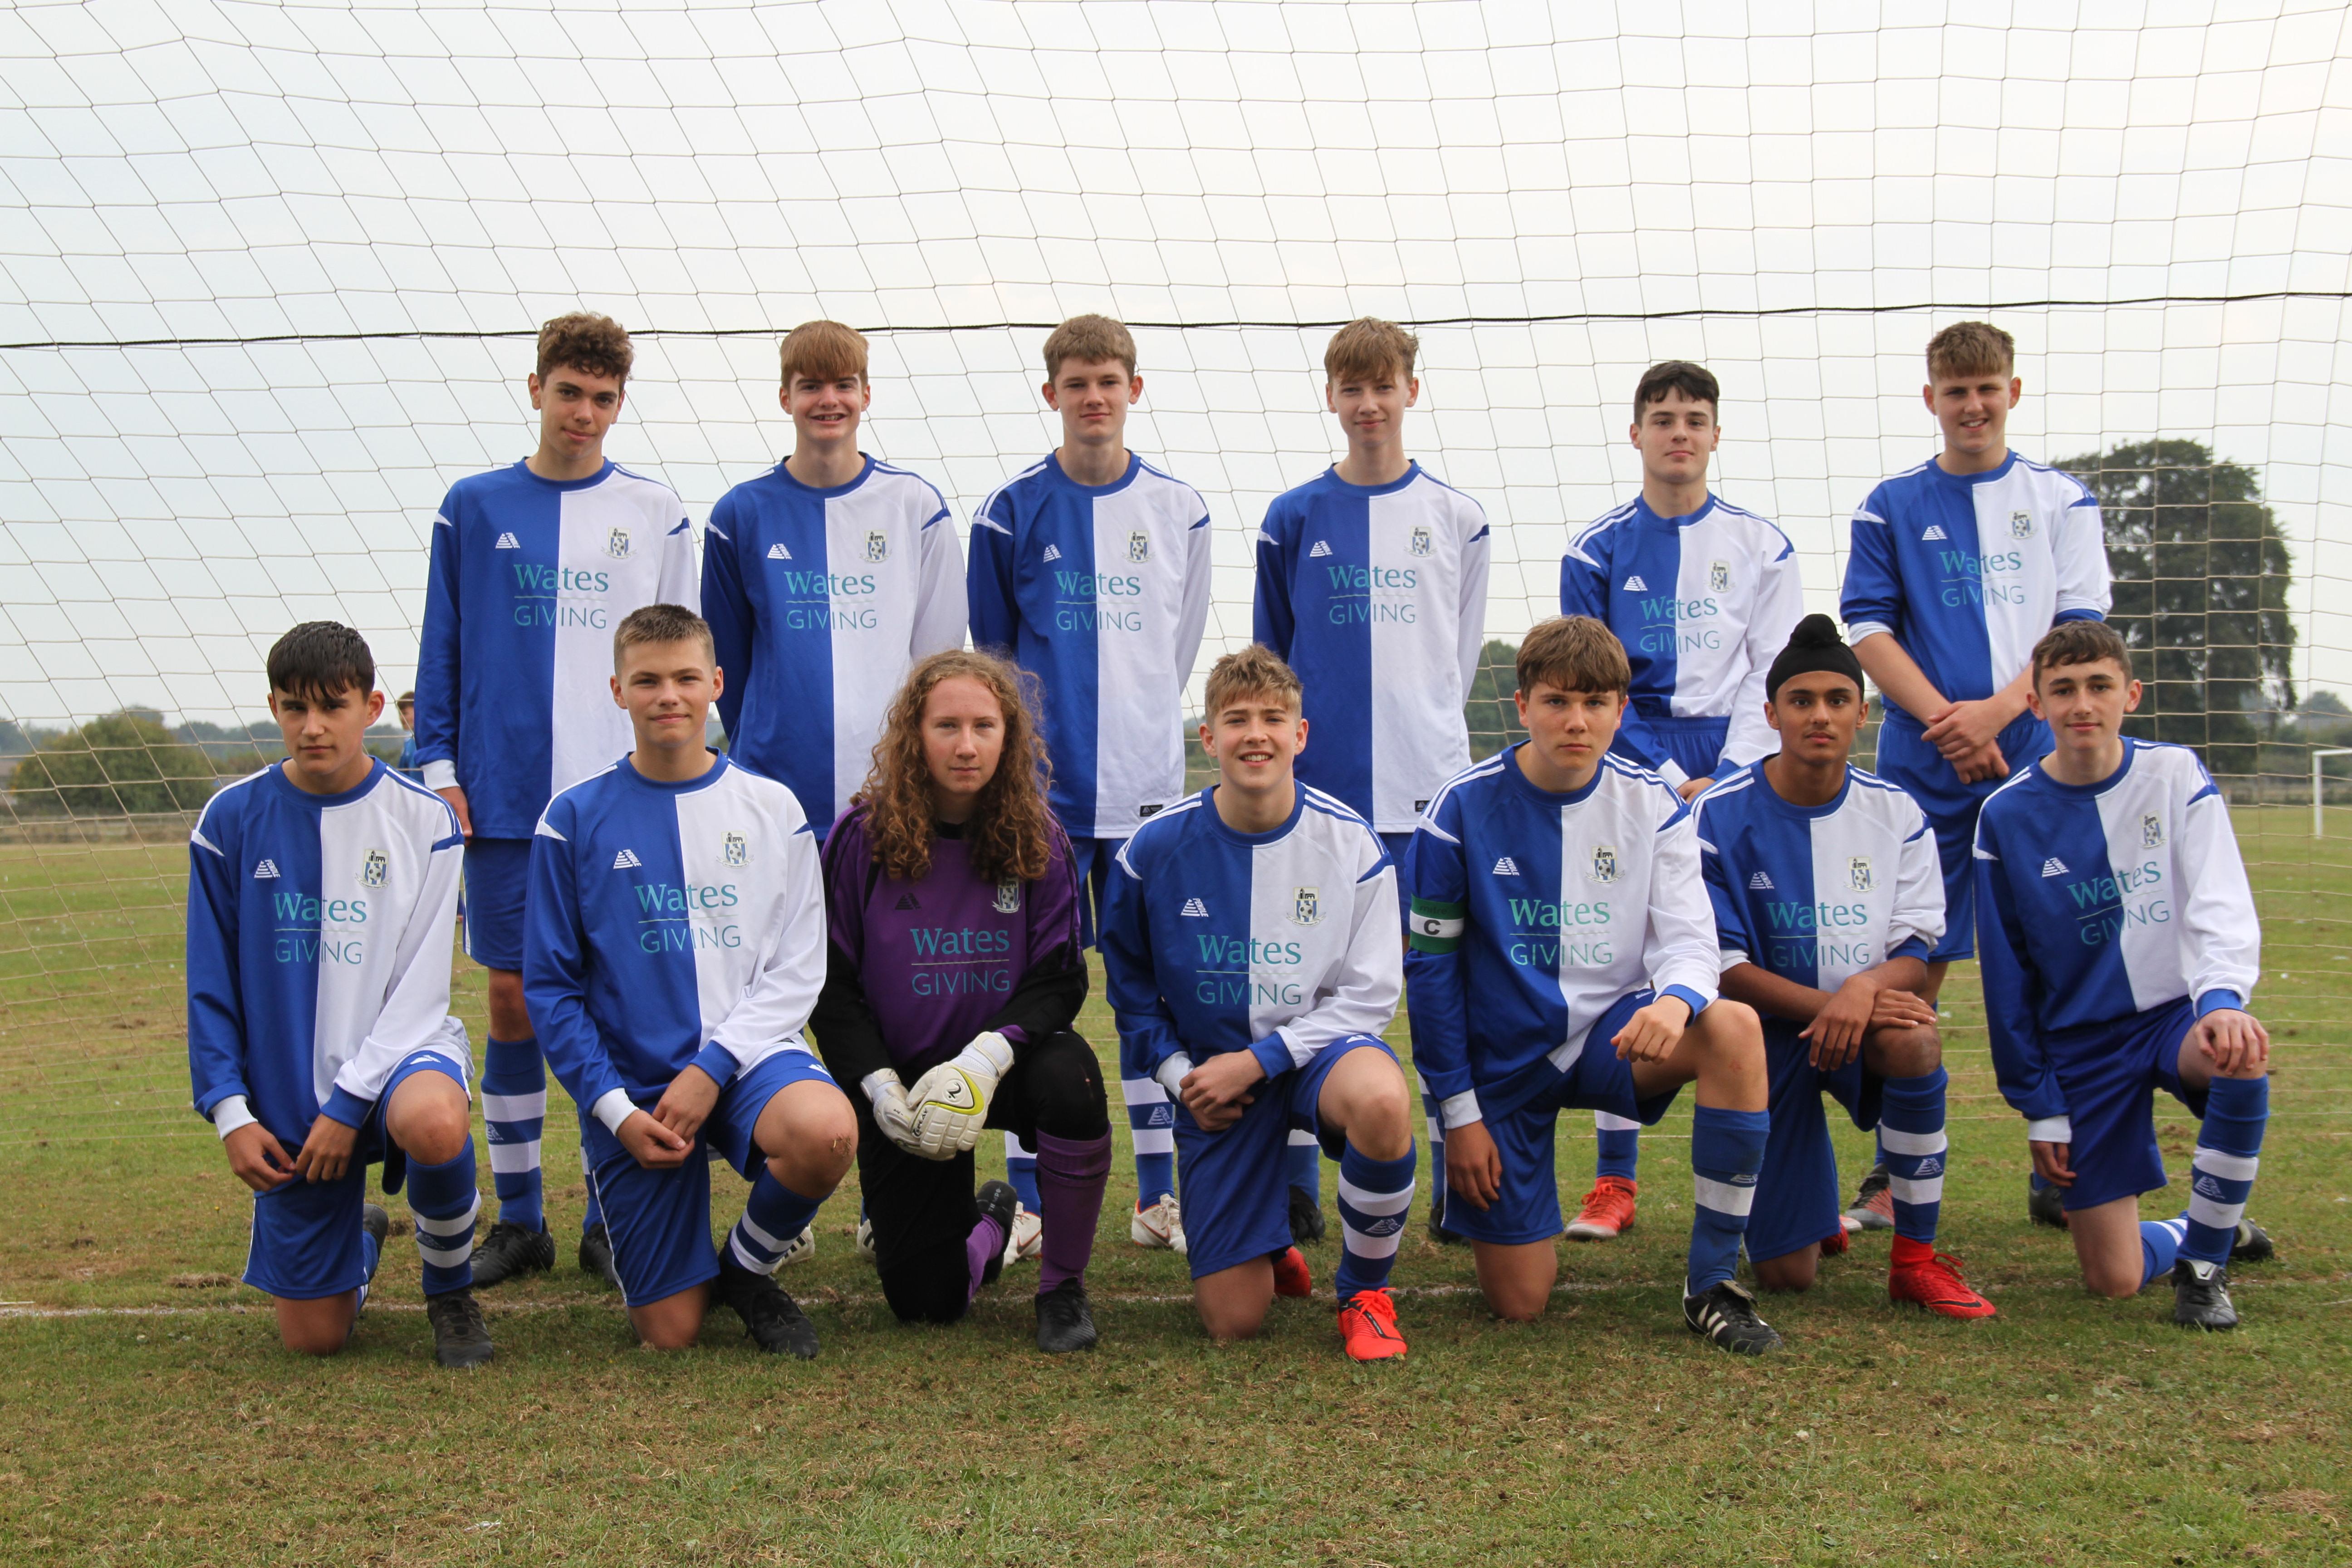 Under 16s (Sunday team)